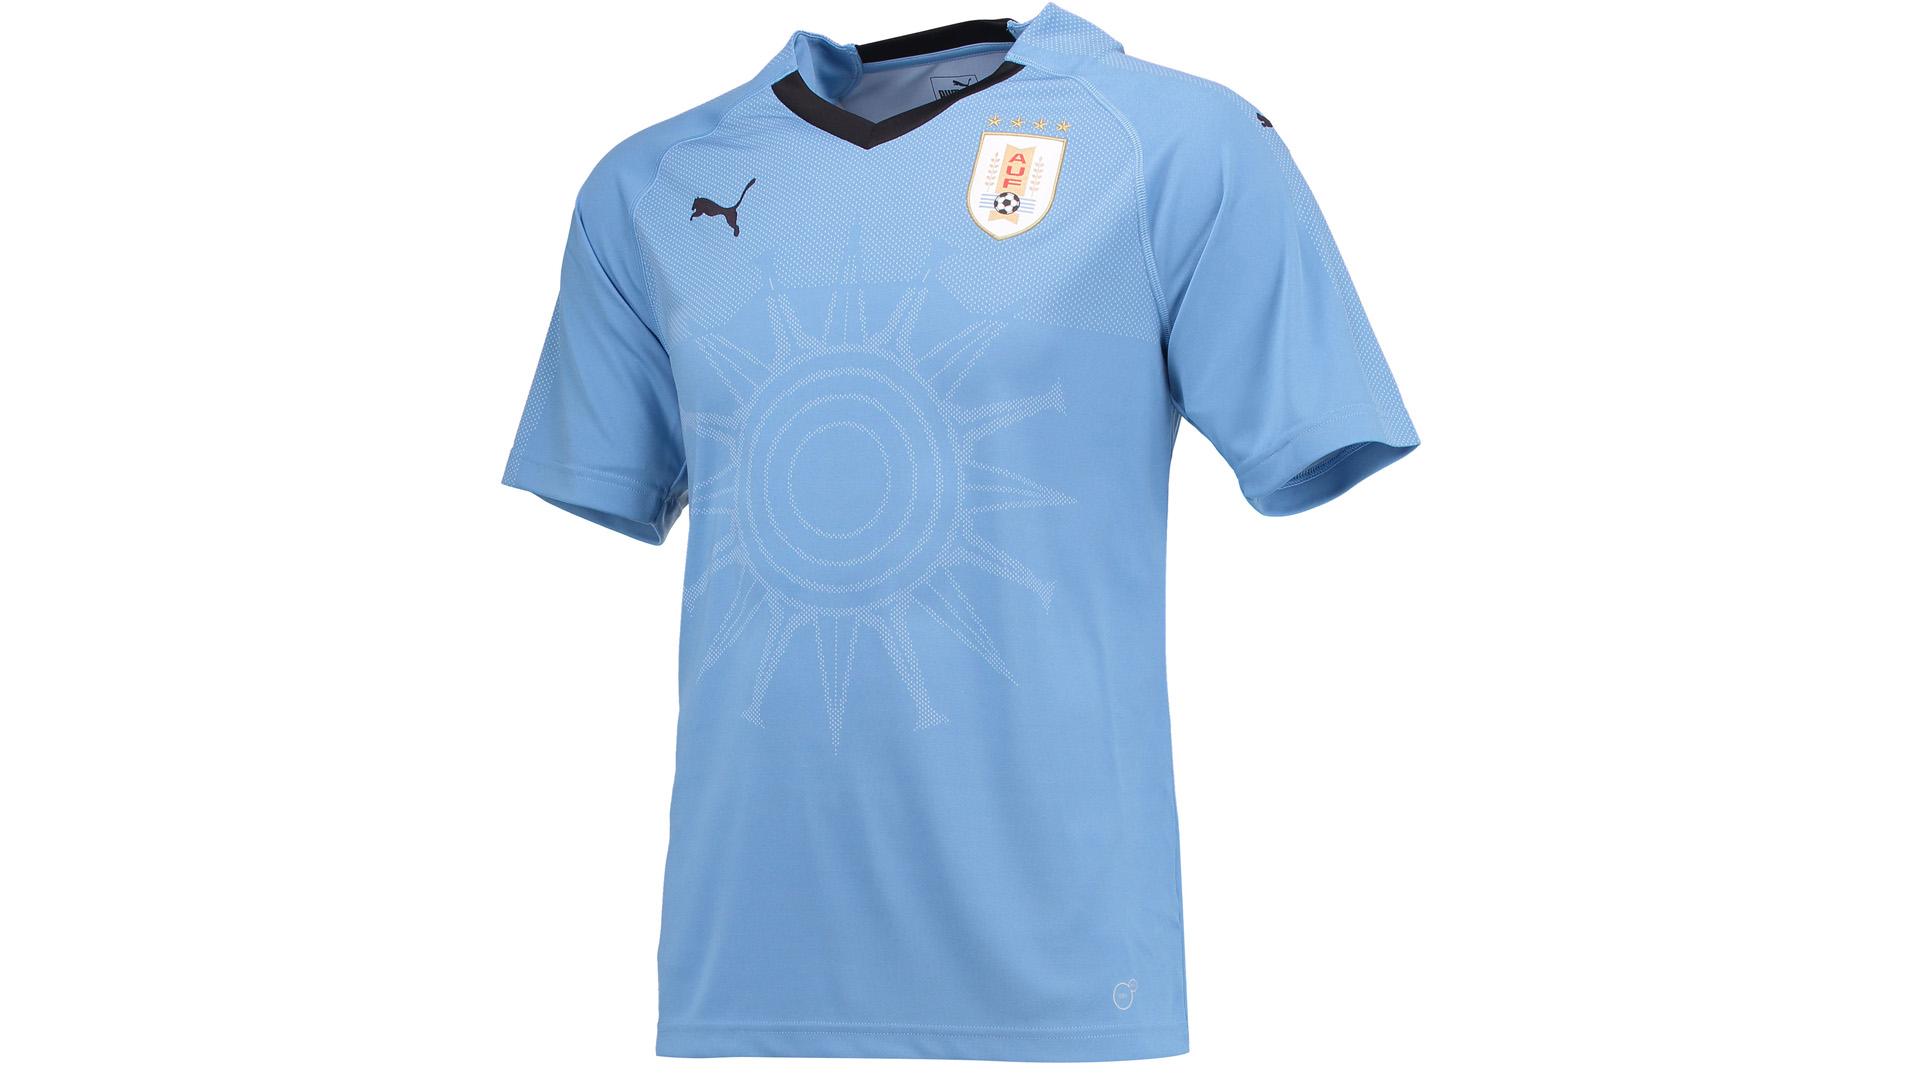 Uruguay Camiseta Titular Home Jersey 2018